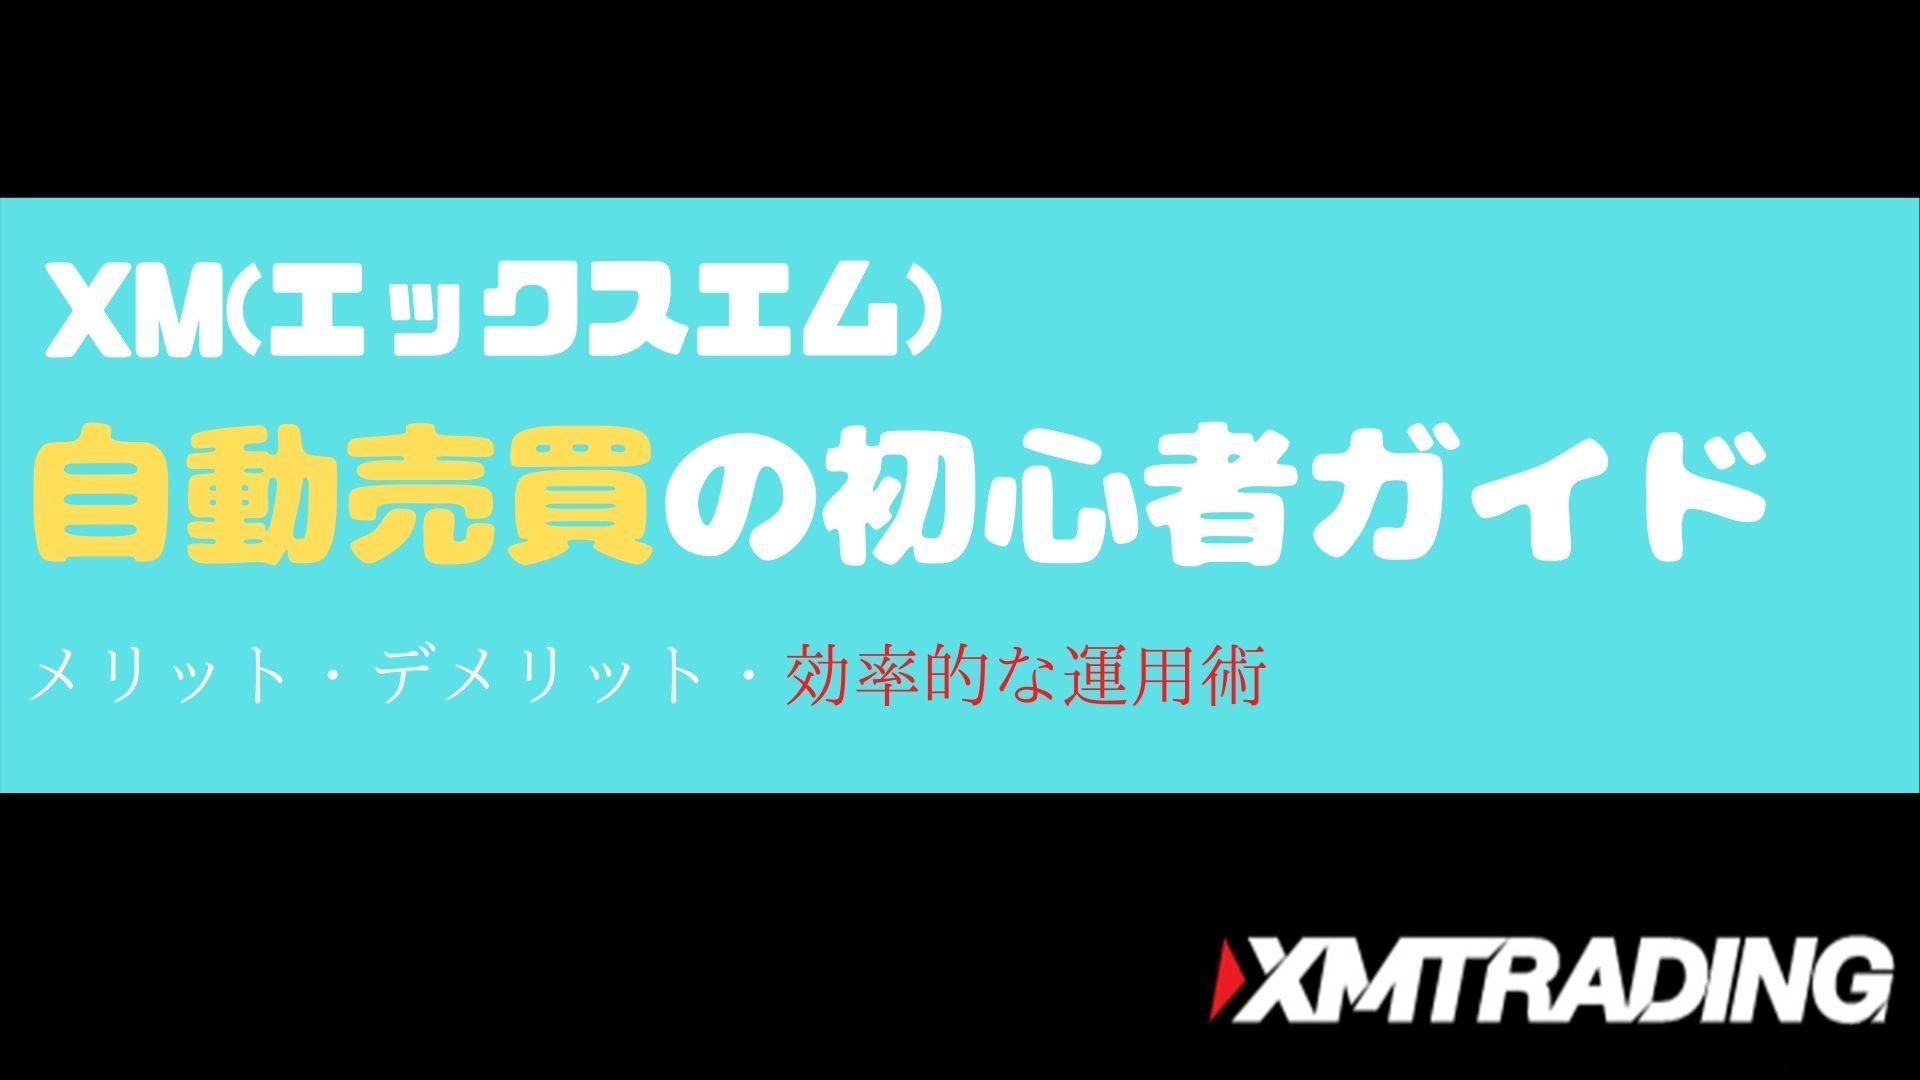 xm-ea-autotrade-title